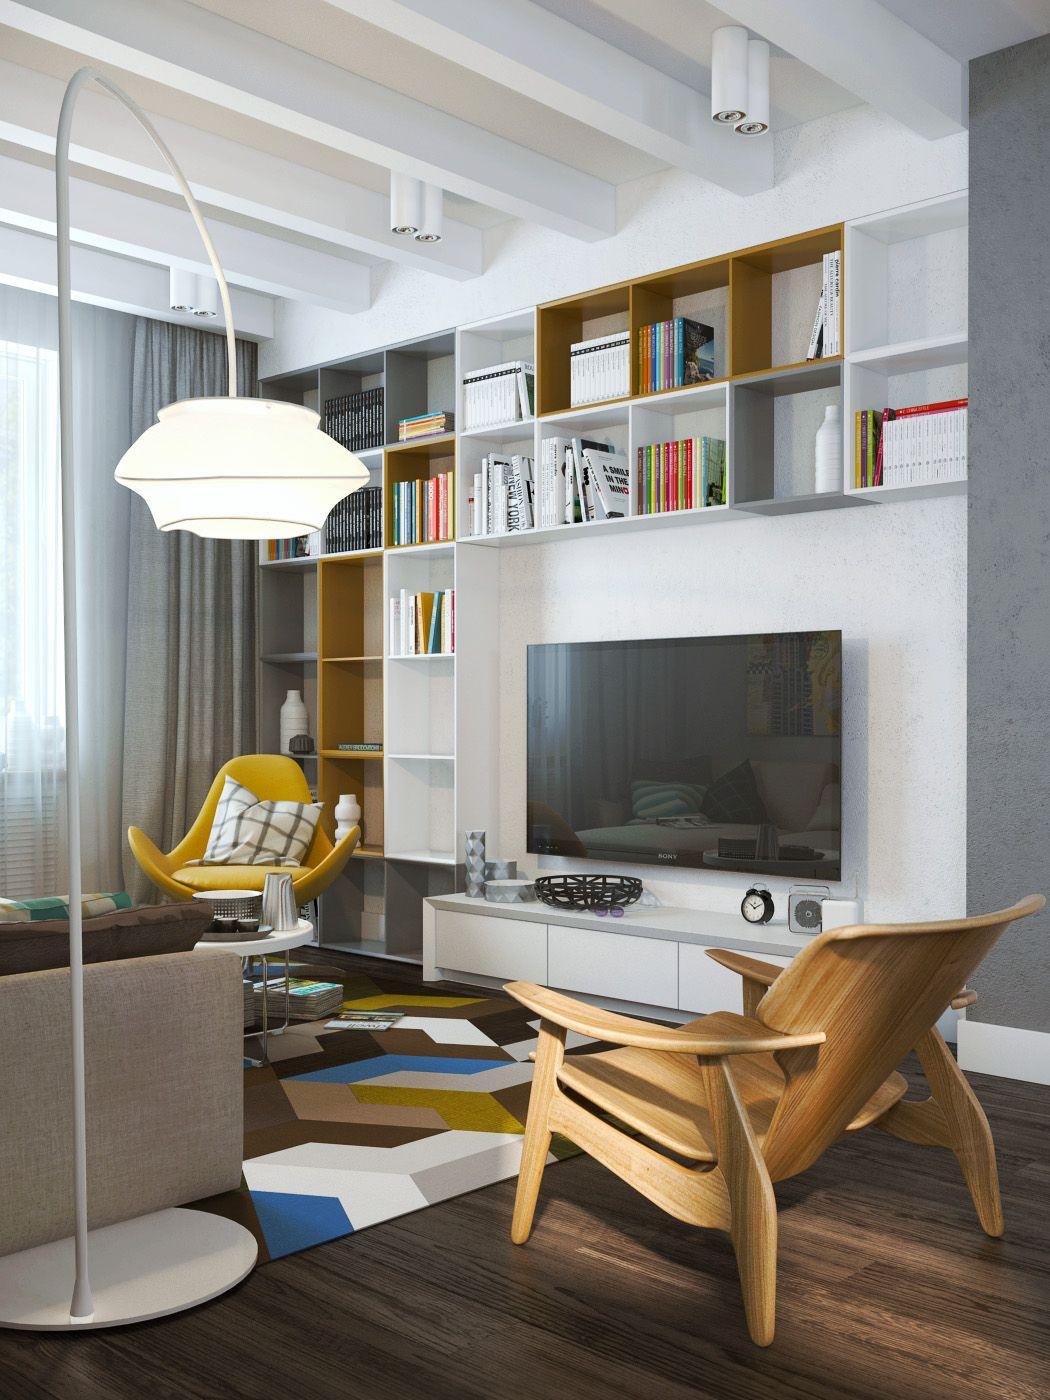 Interior Design Living Room Walls: Exposed Concrete Walls Ideas & Inspiration